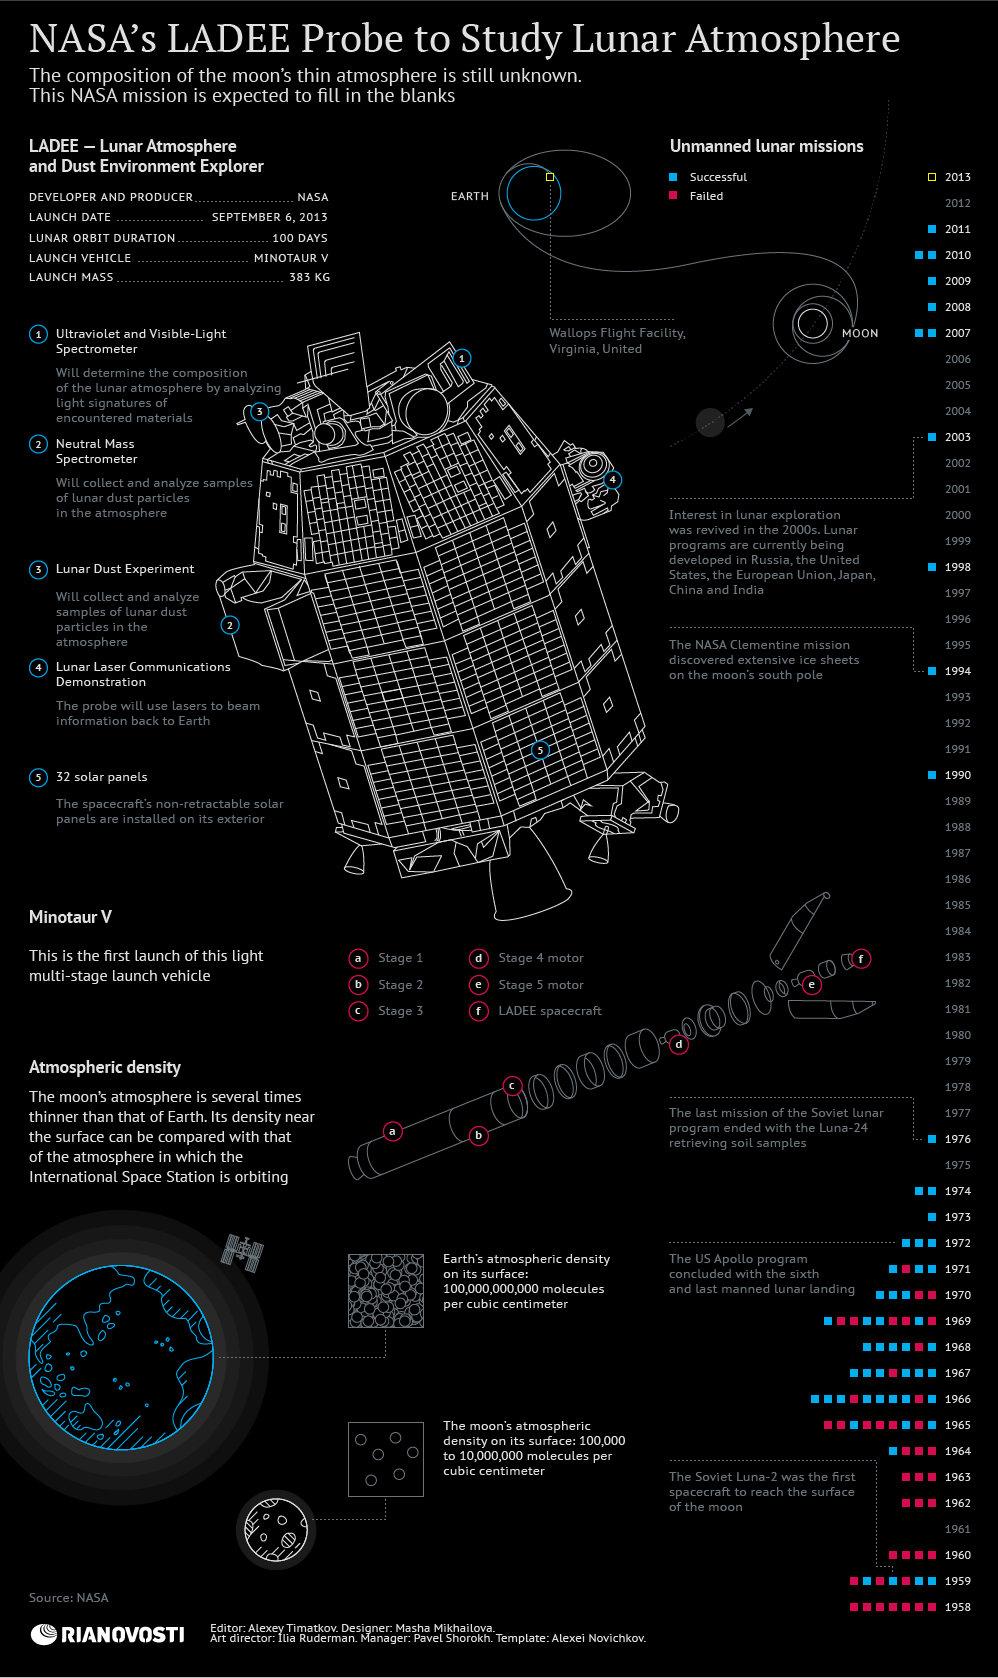 NASA's LADEE Probe to Study Lunar Atmosphere